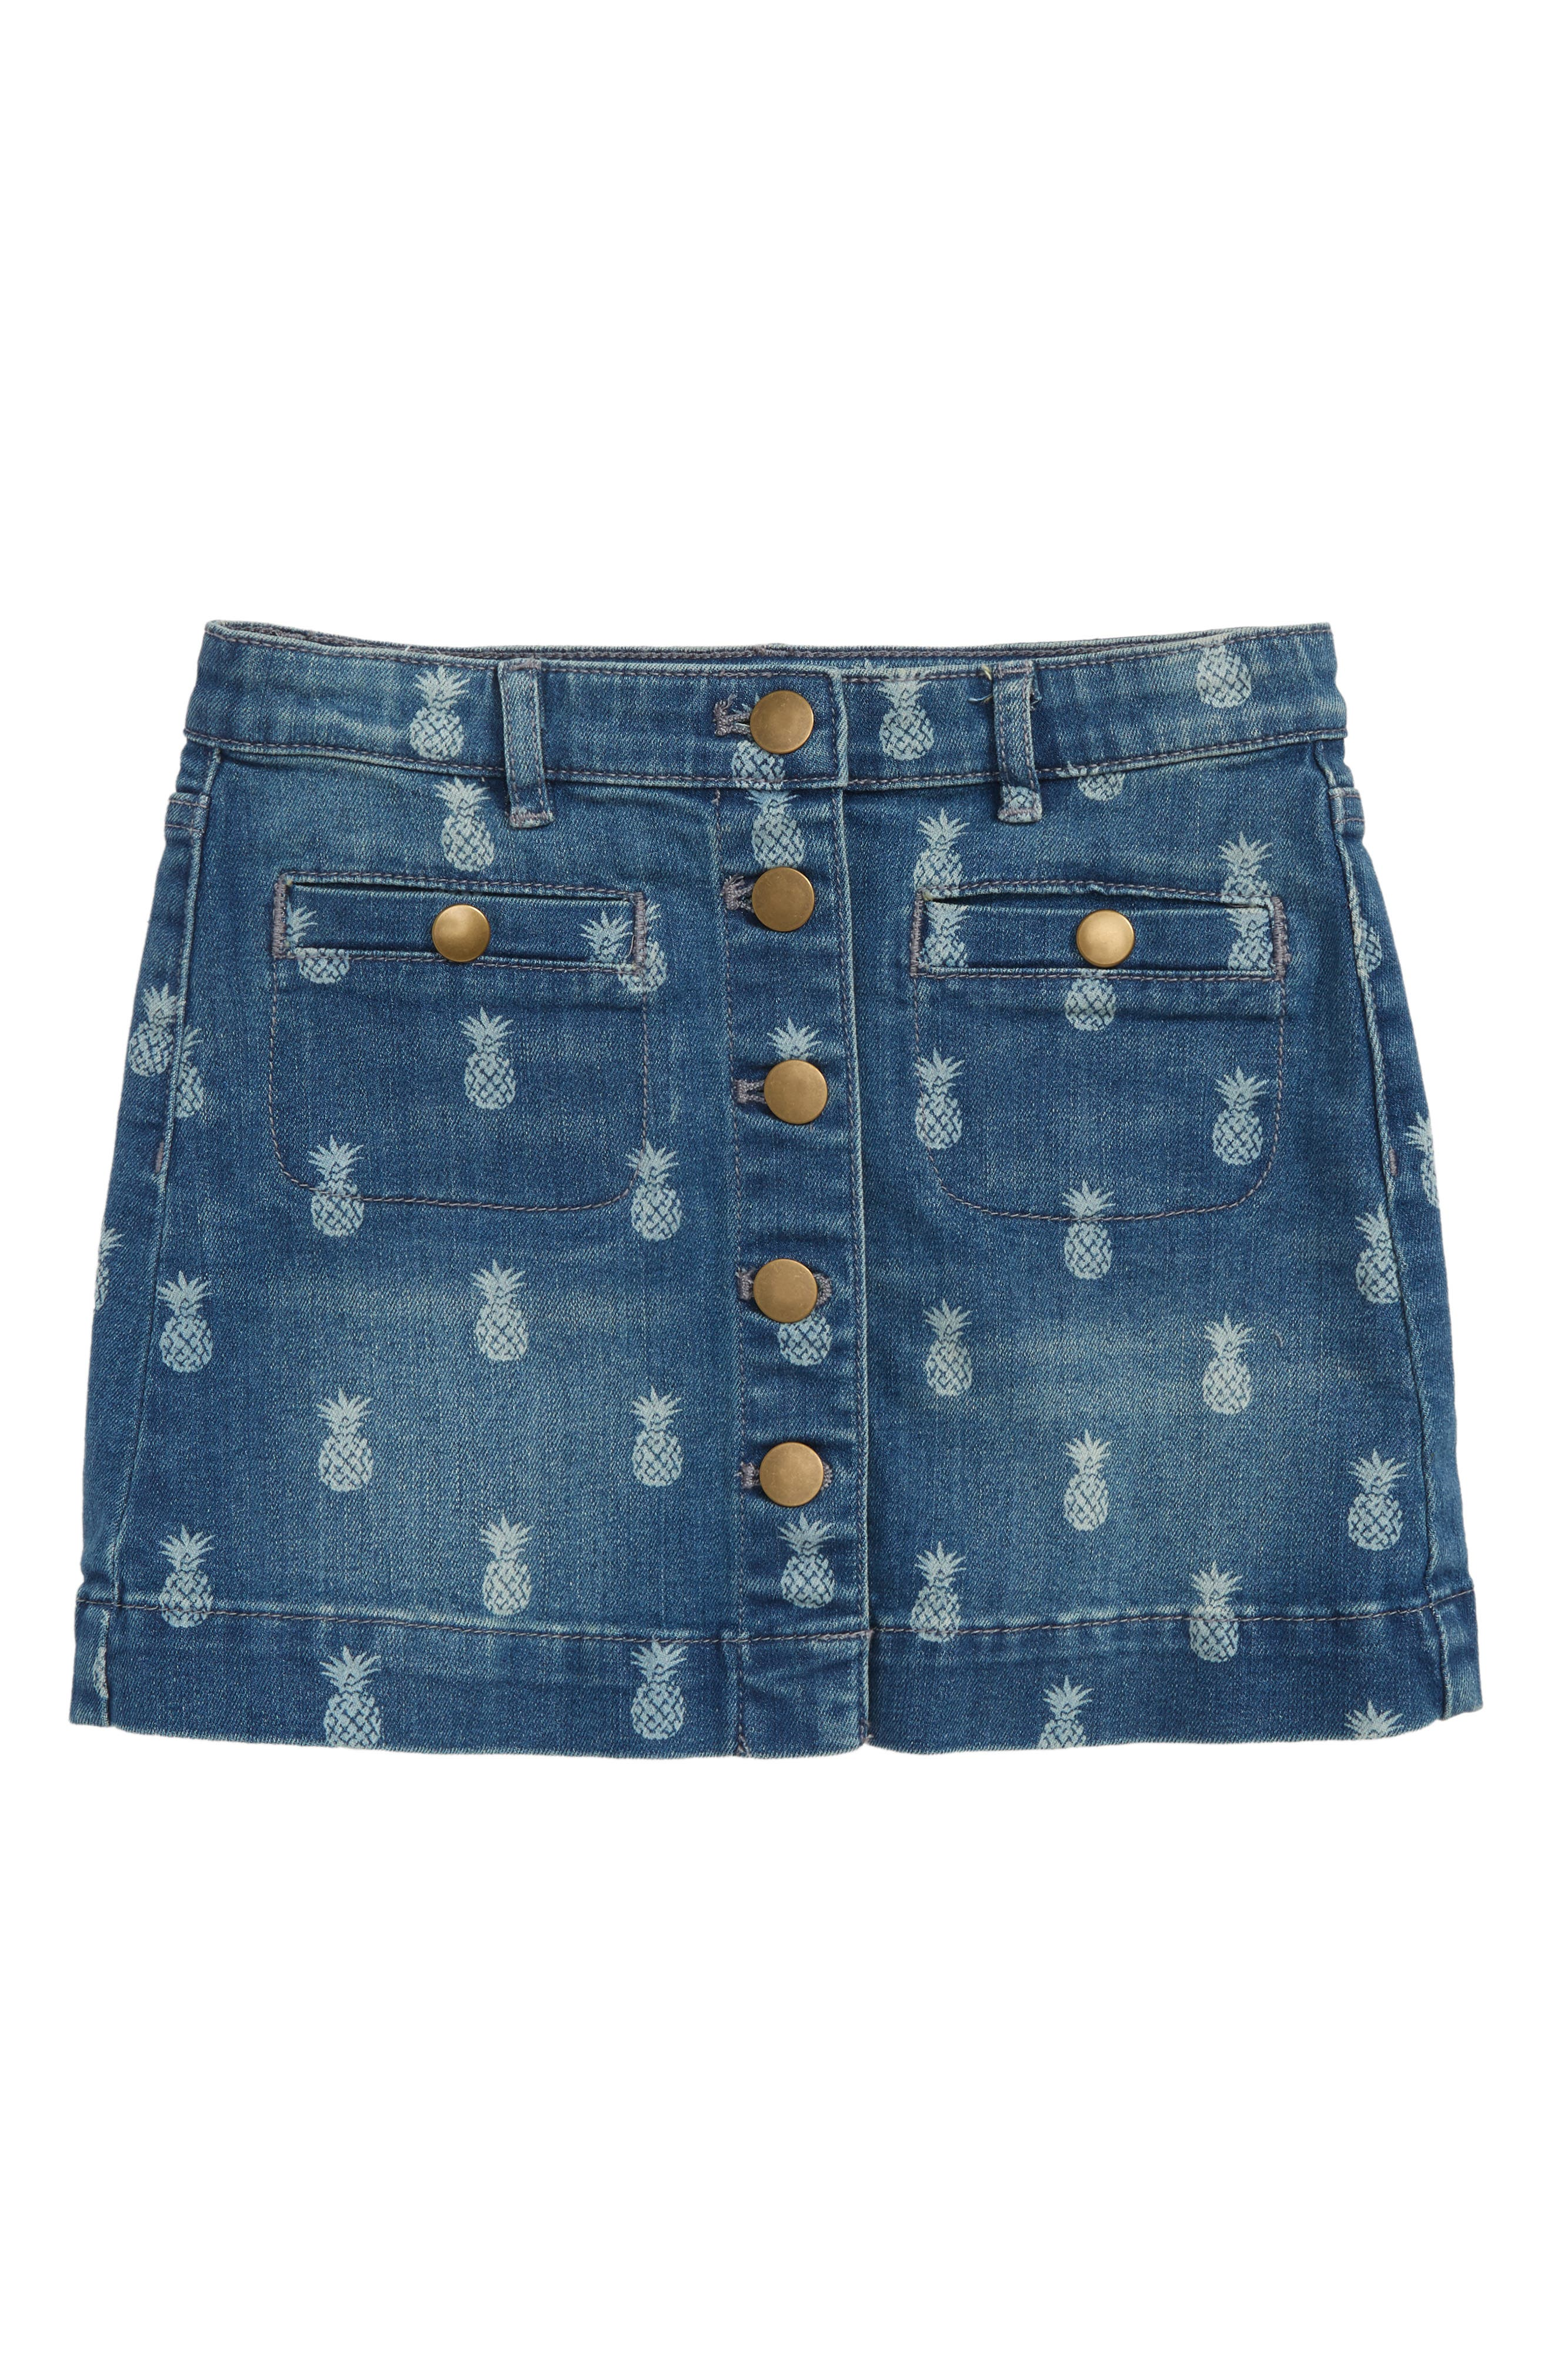 Pineapple Print Denim Skirt,                         Main,                         color, Indigo Ivory